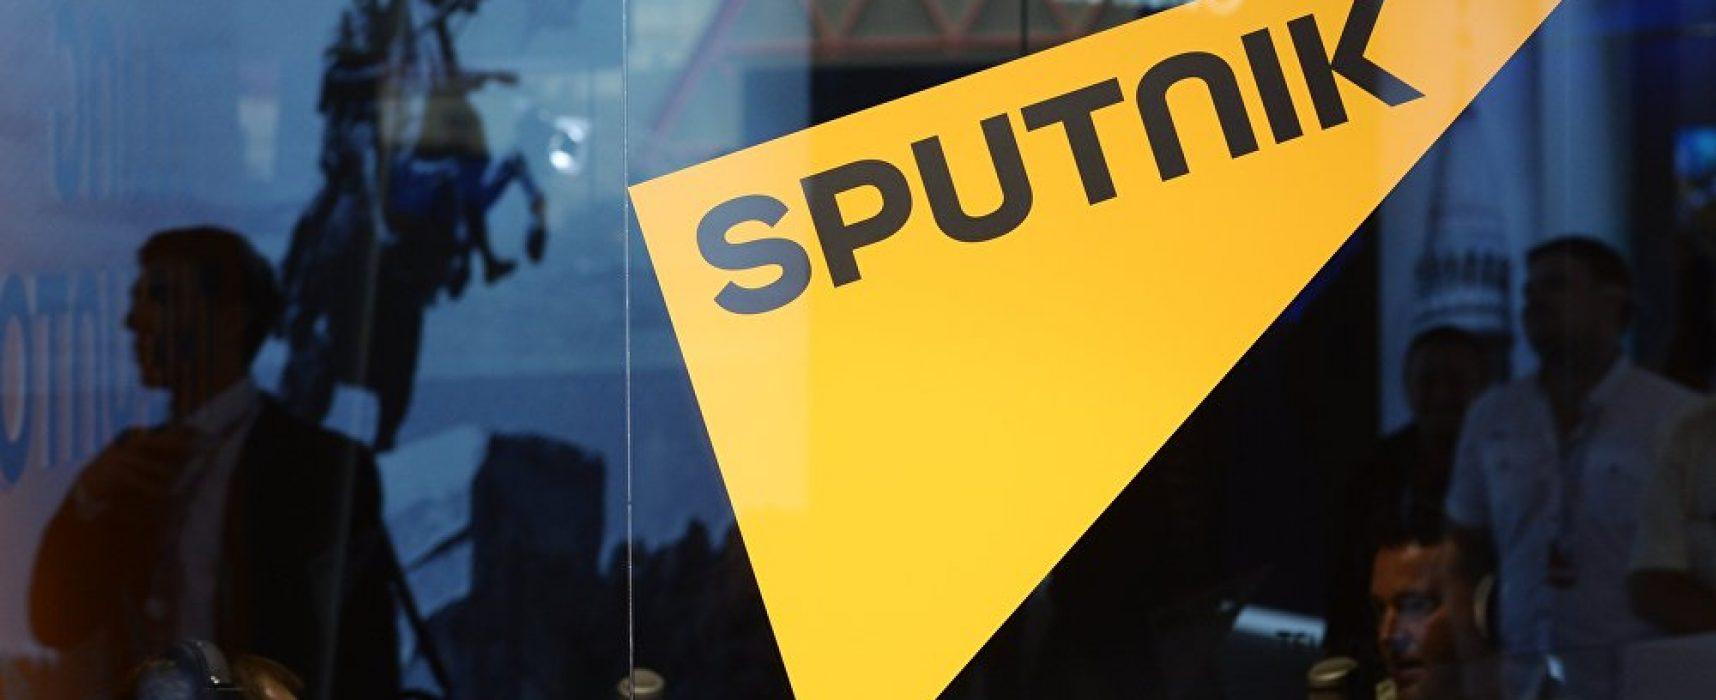 Russia's Sputnik Now Partners with Slovakia's Largest News Agency